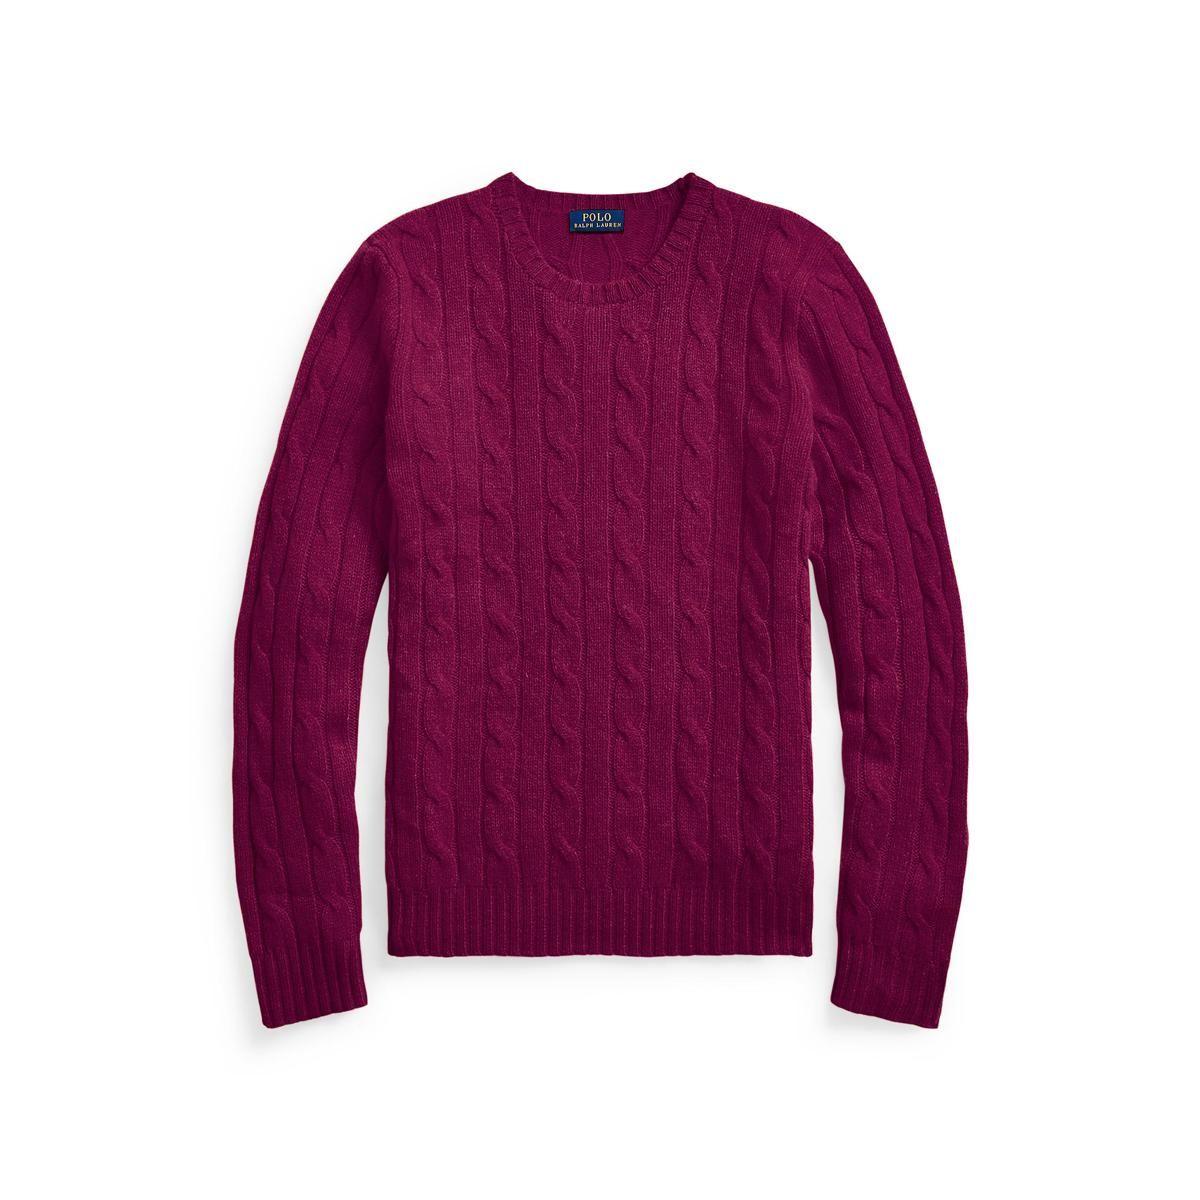 polo ralph lauren julianna cashmere cable sweater